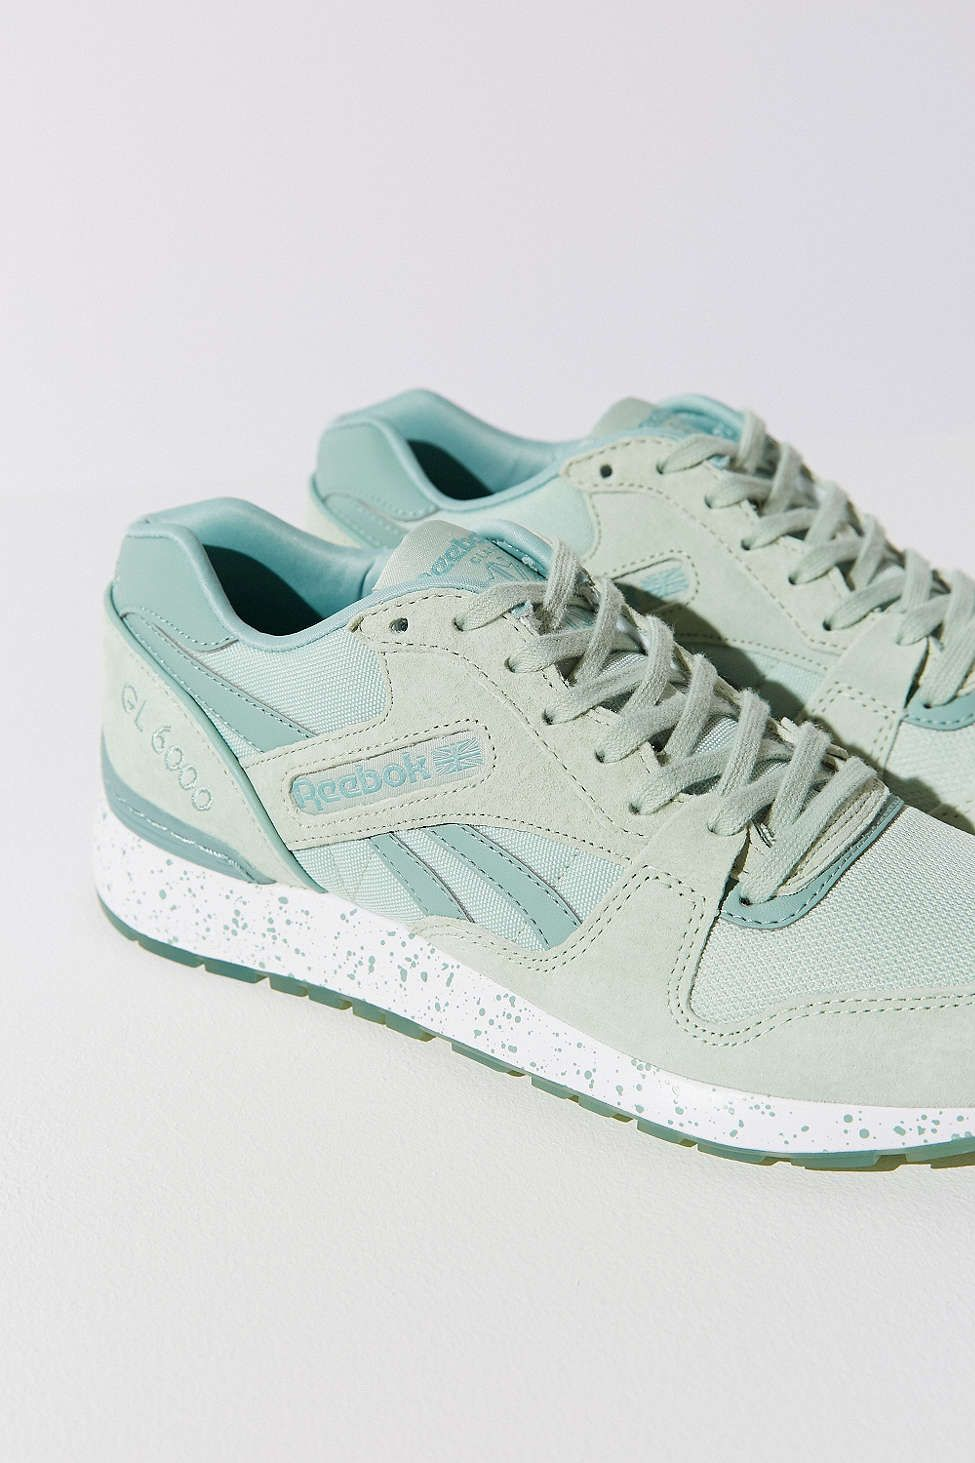 ae98fd2b5632 ... sale reebok gl 6000 ice running sneaker 3c1d9 5bea2